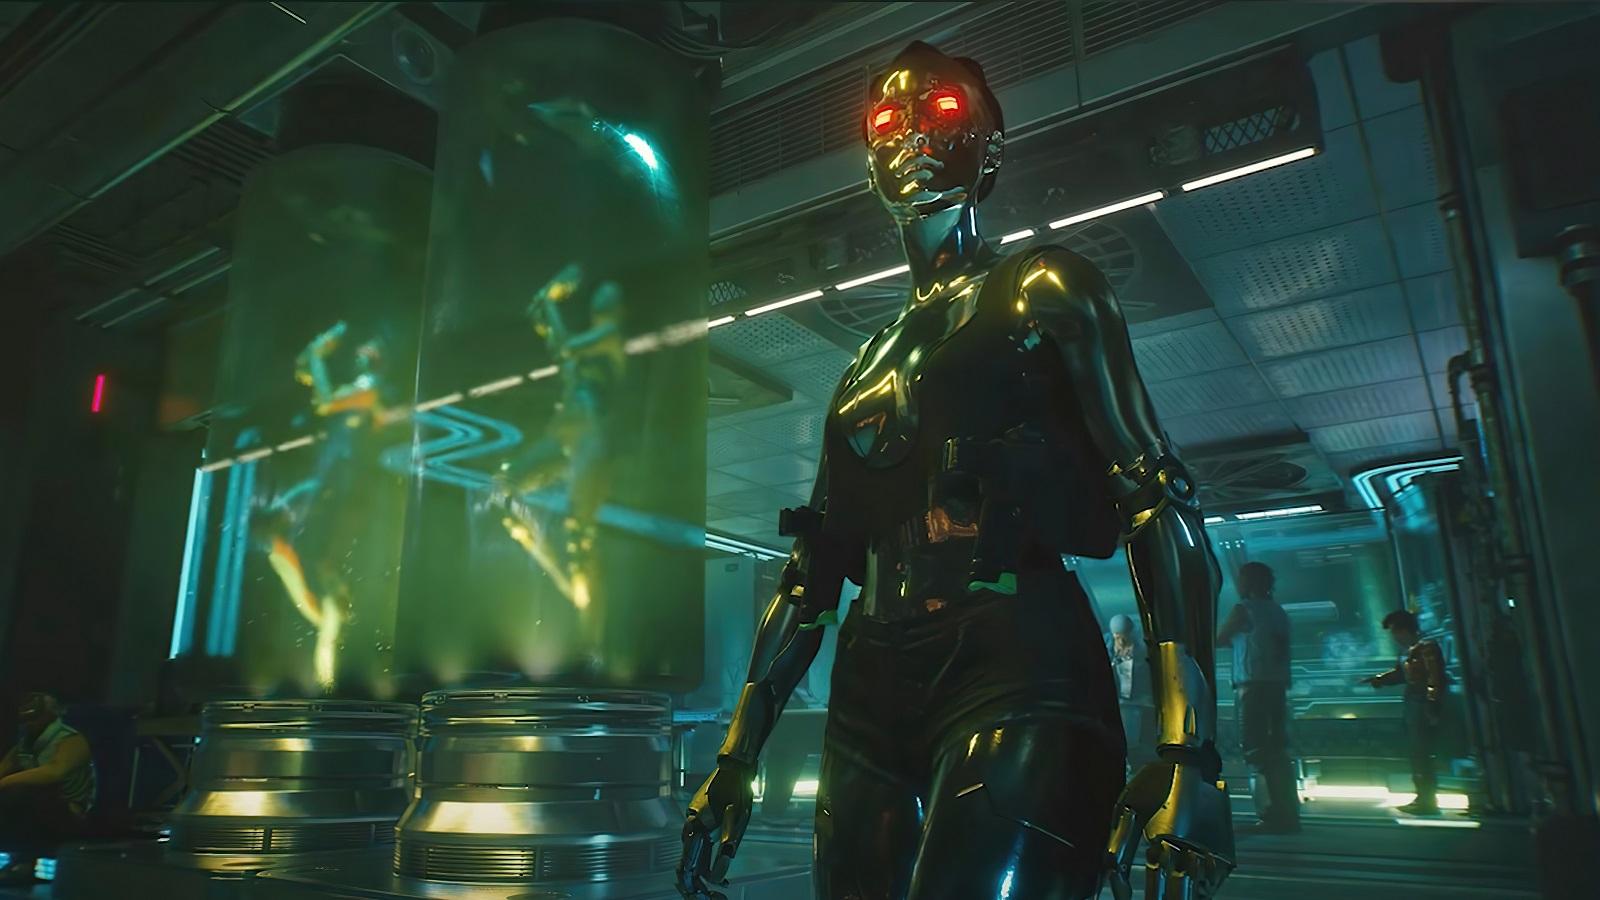 Успех обеспечен: Cyberpunk 2077 предзаказало 8 млн человек